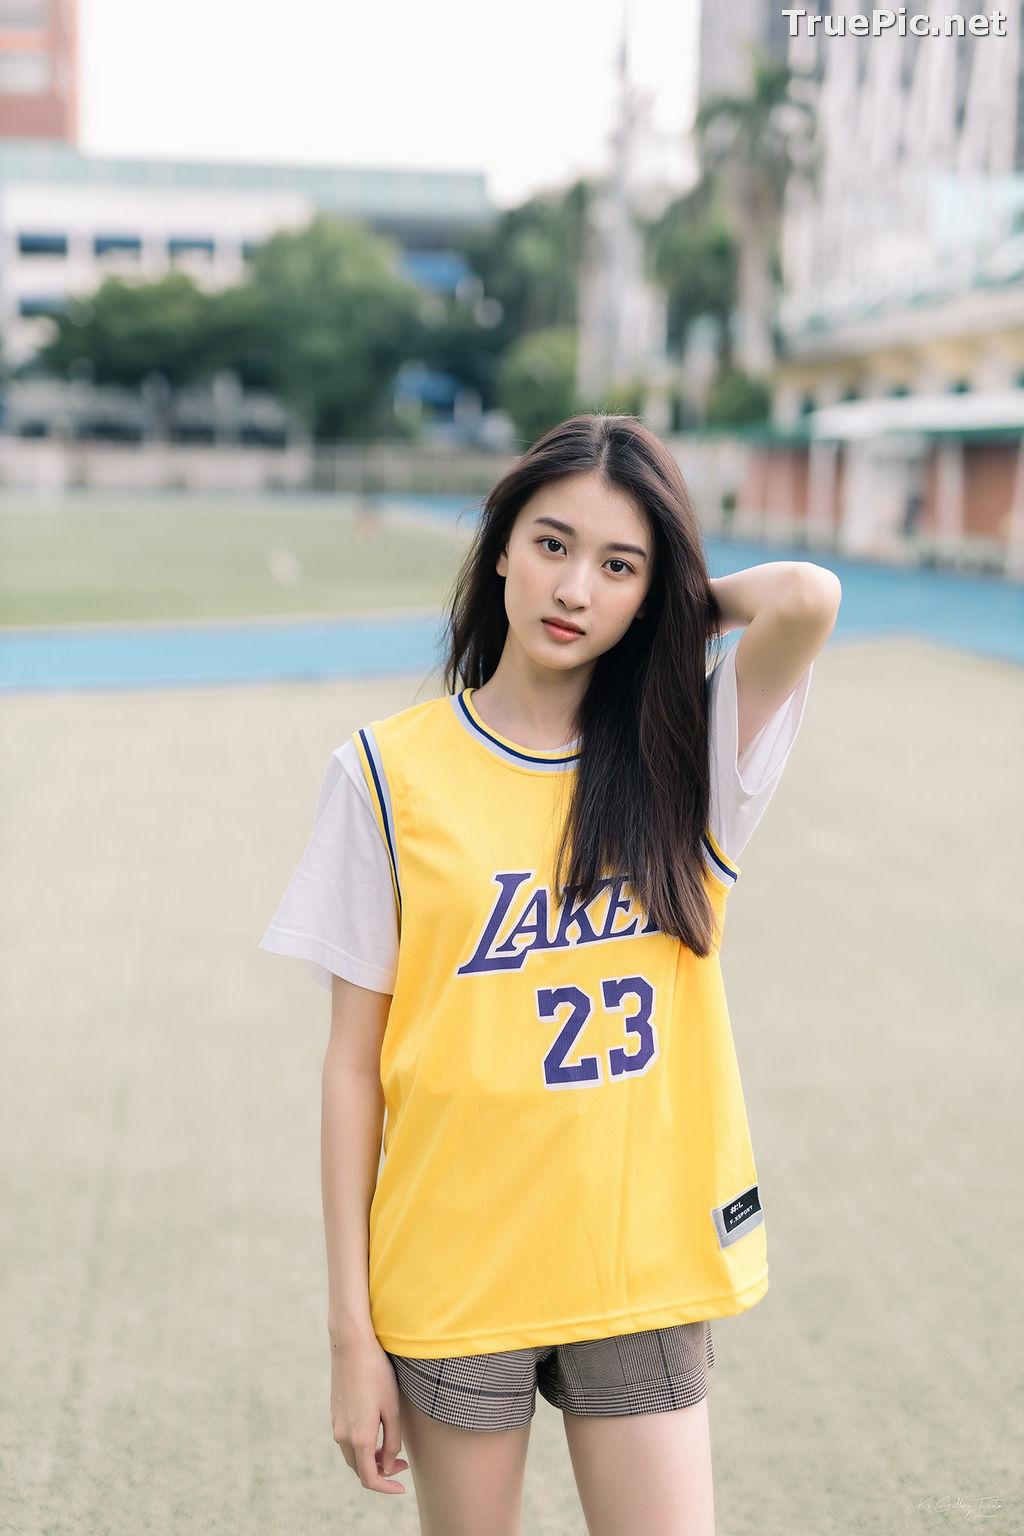 Image Thailand Beautiful Girl - View Benyapa - Long Hair Sport Girl - TruePic.net - Picture-10